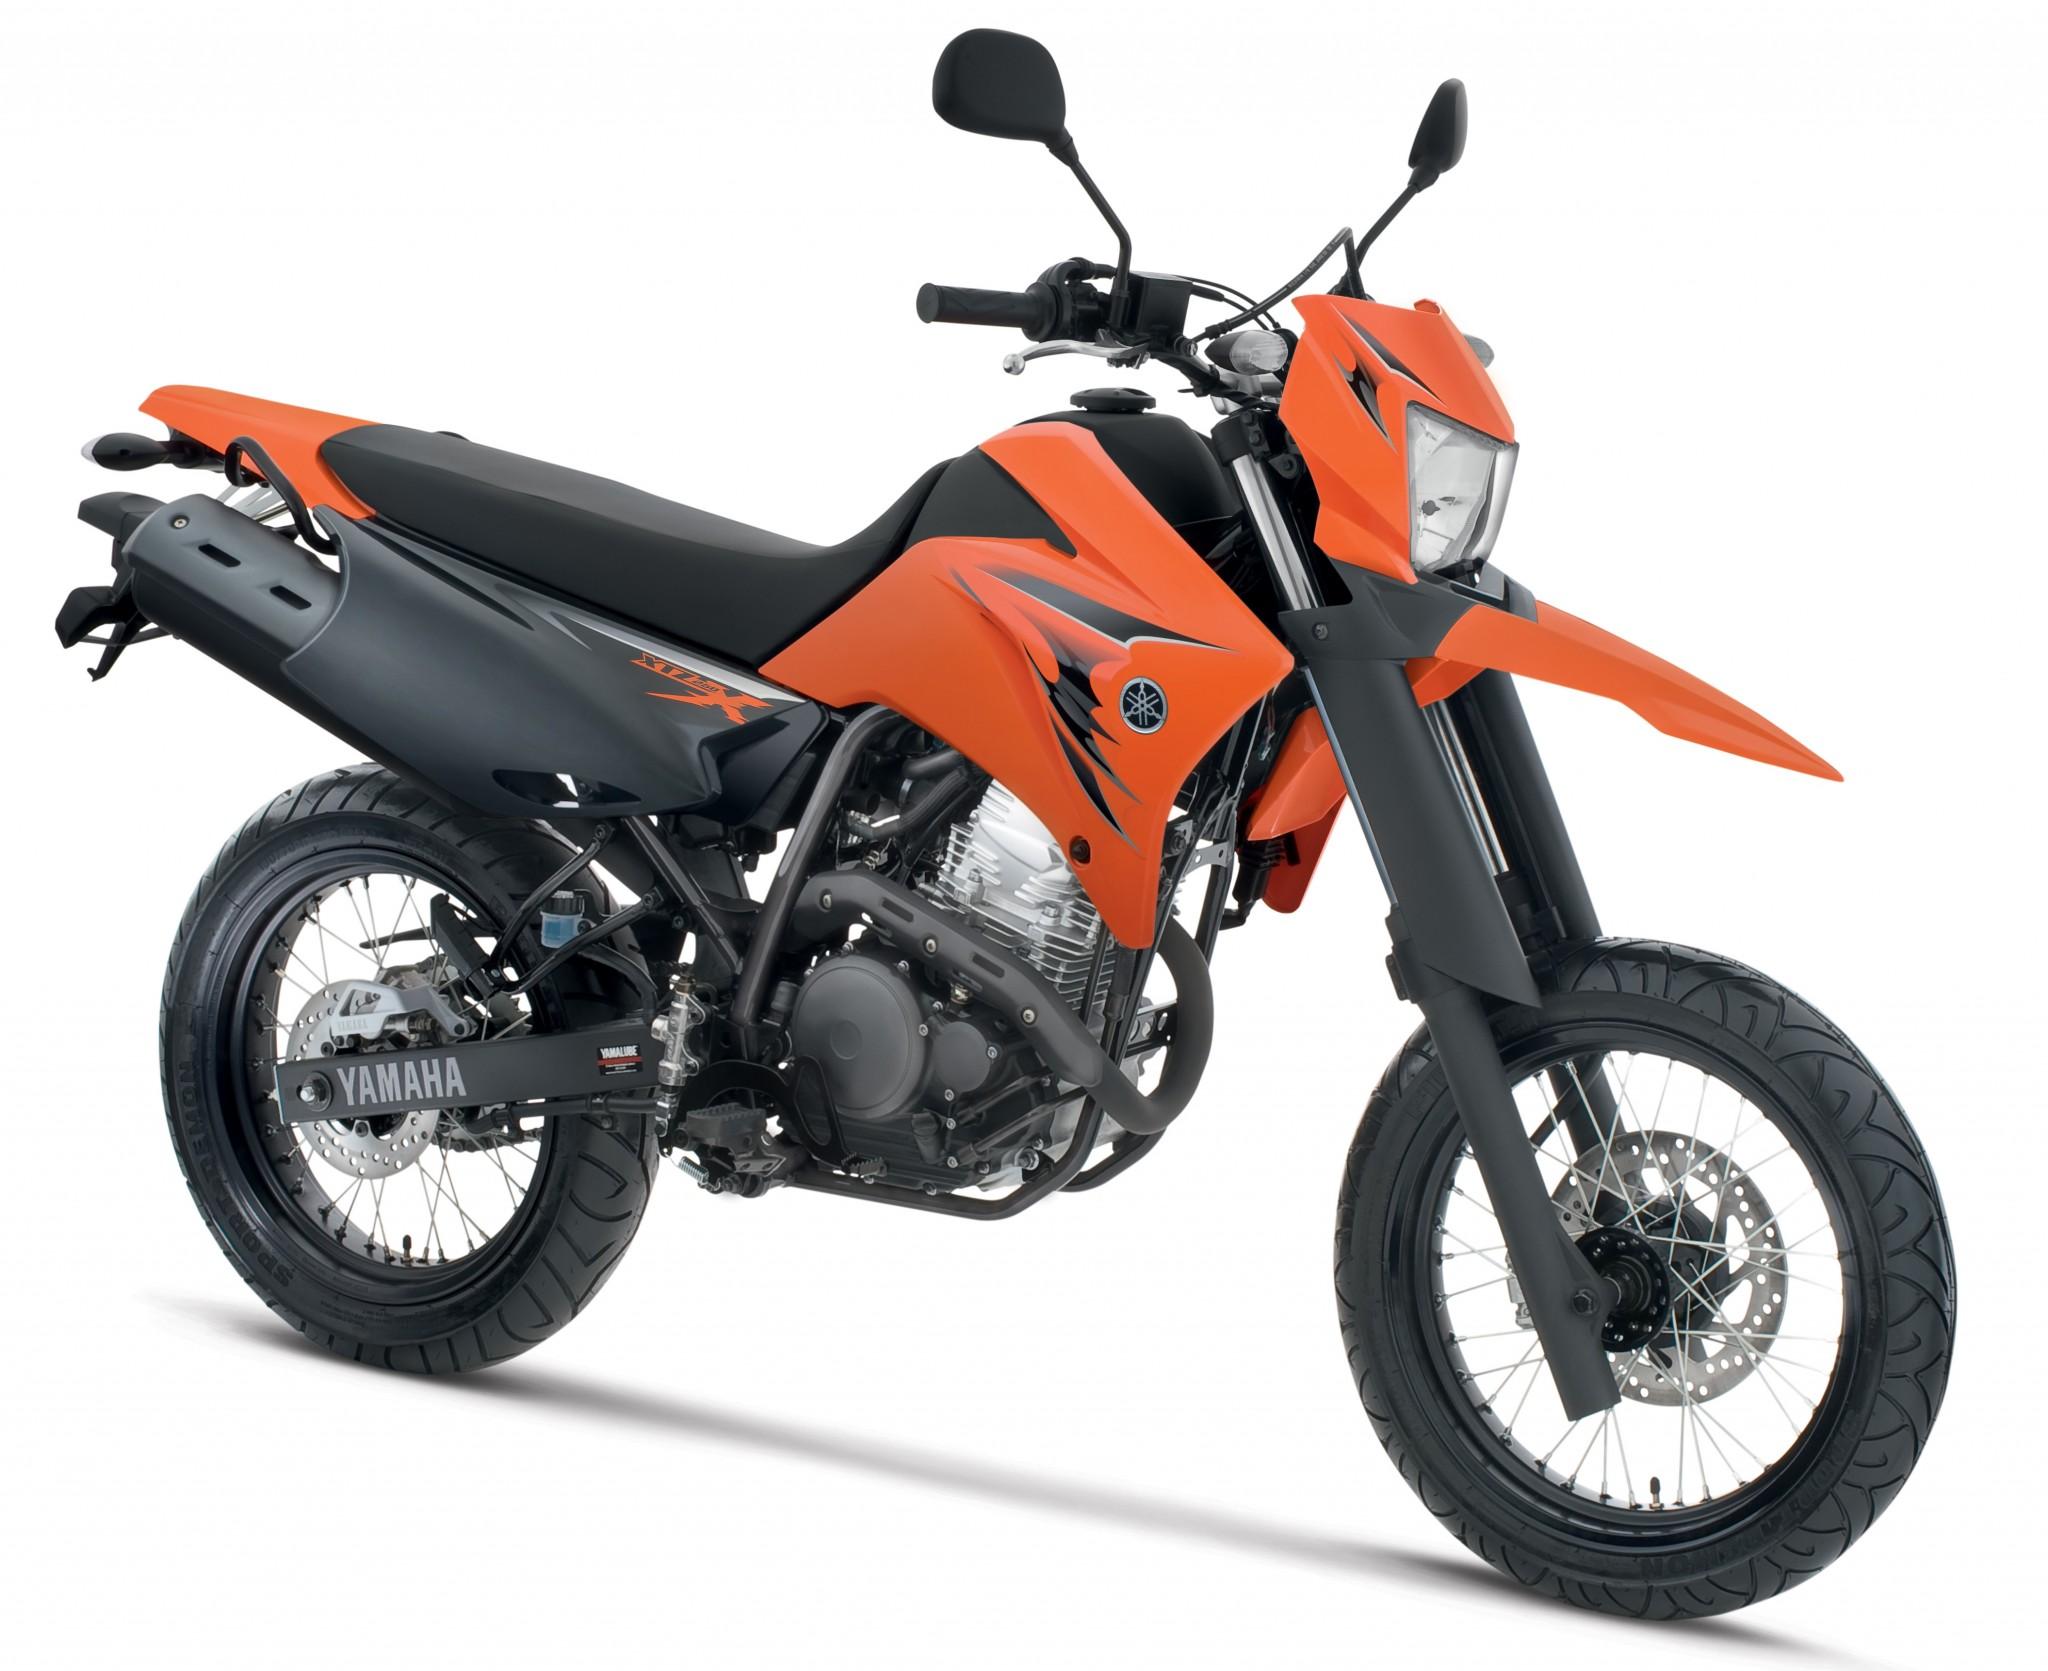 yamaha lan a xtz250 lander 2009 e a xtz250x a lander motard motos blog. Black Bedroom Furniture Sets. Home Design Ideas